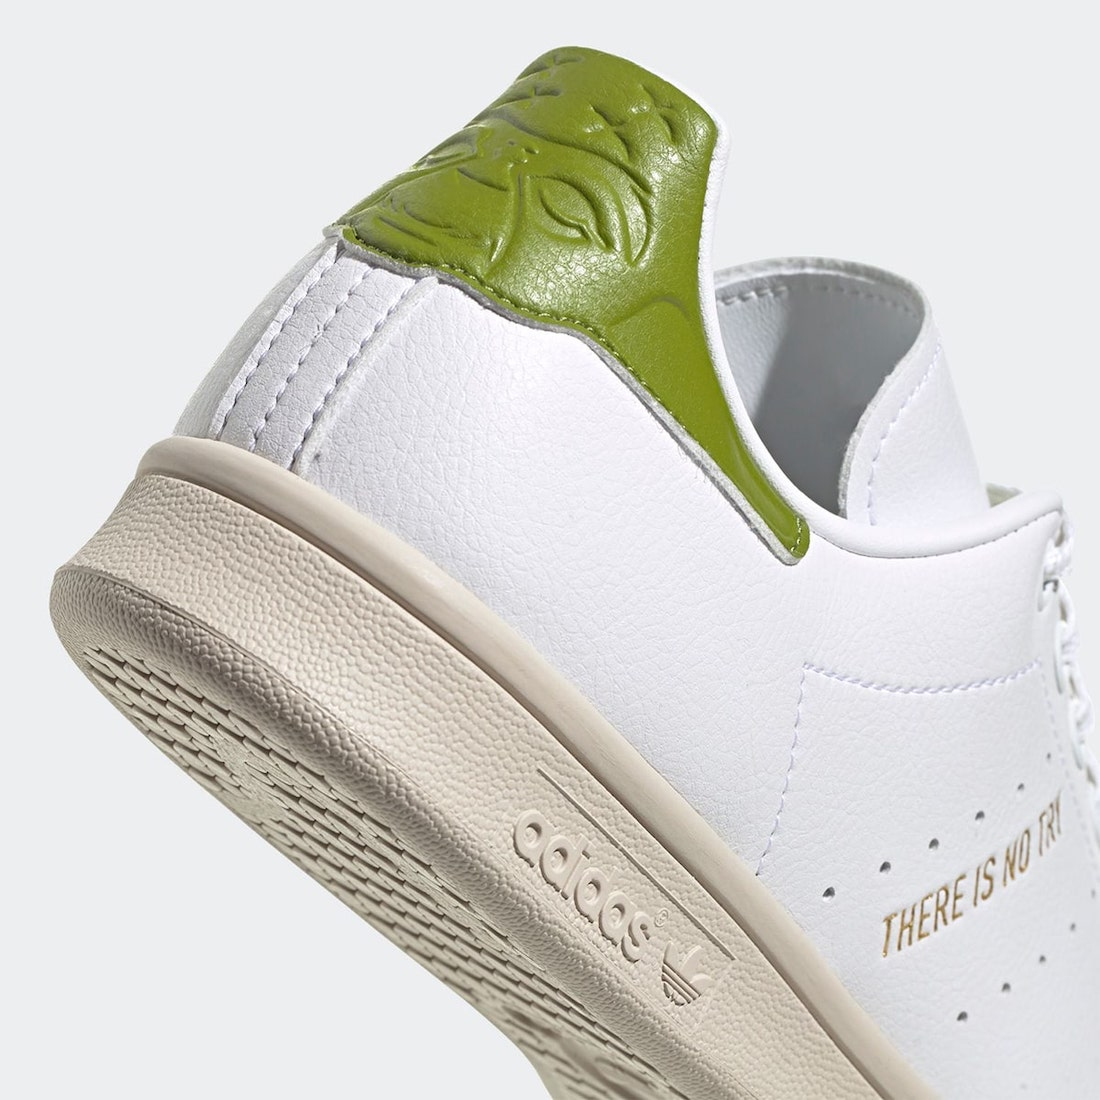 Star-Wars-adidas-Stan-Smith-Yoda-FY5463-Release-Date-6